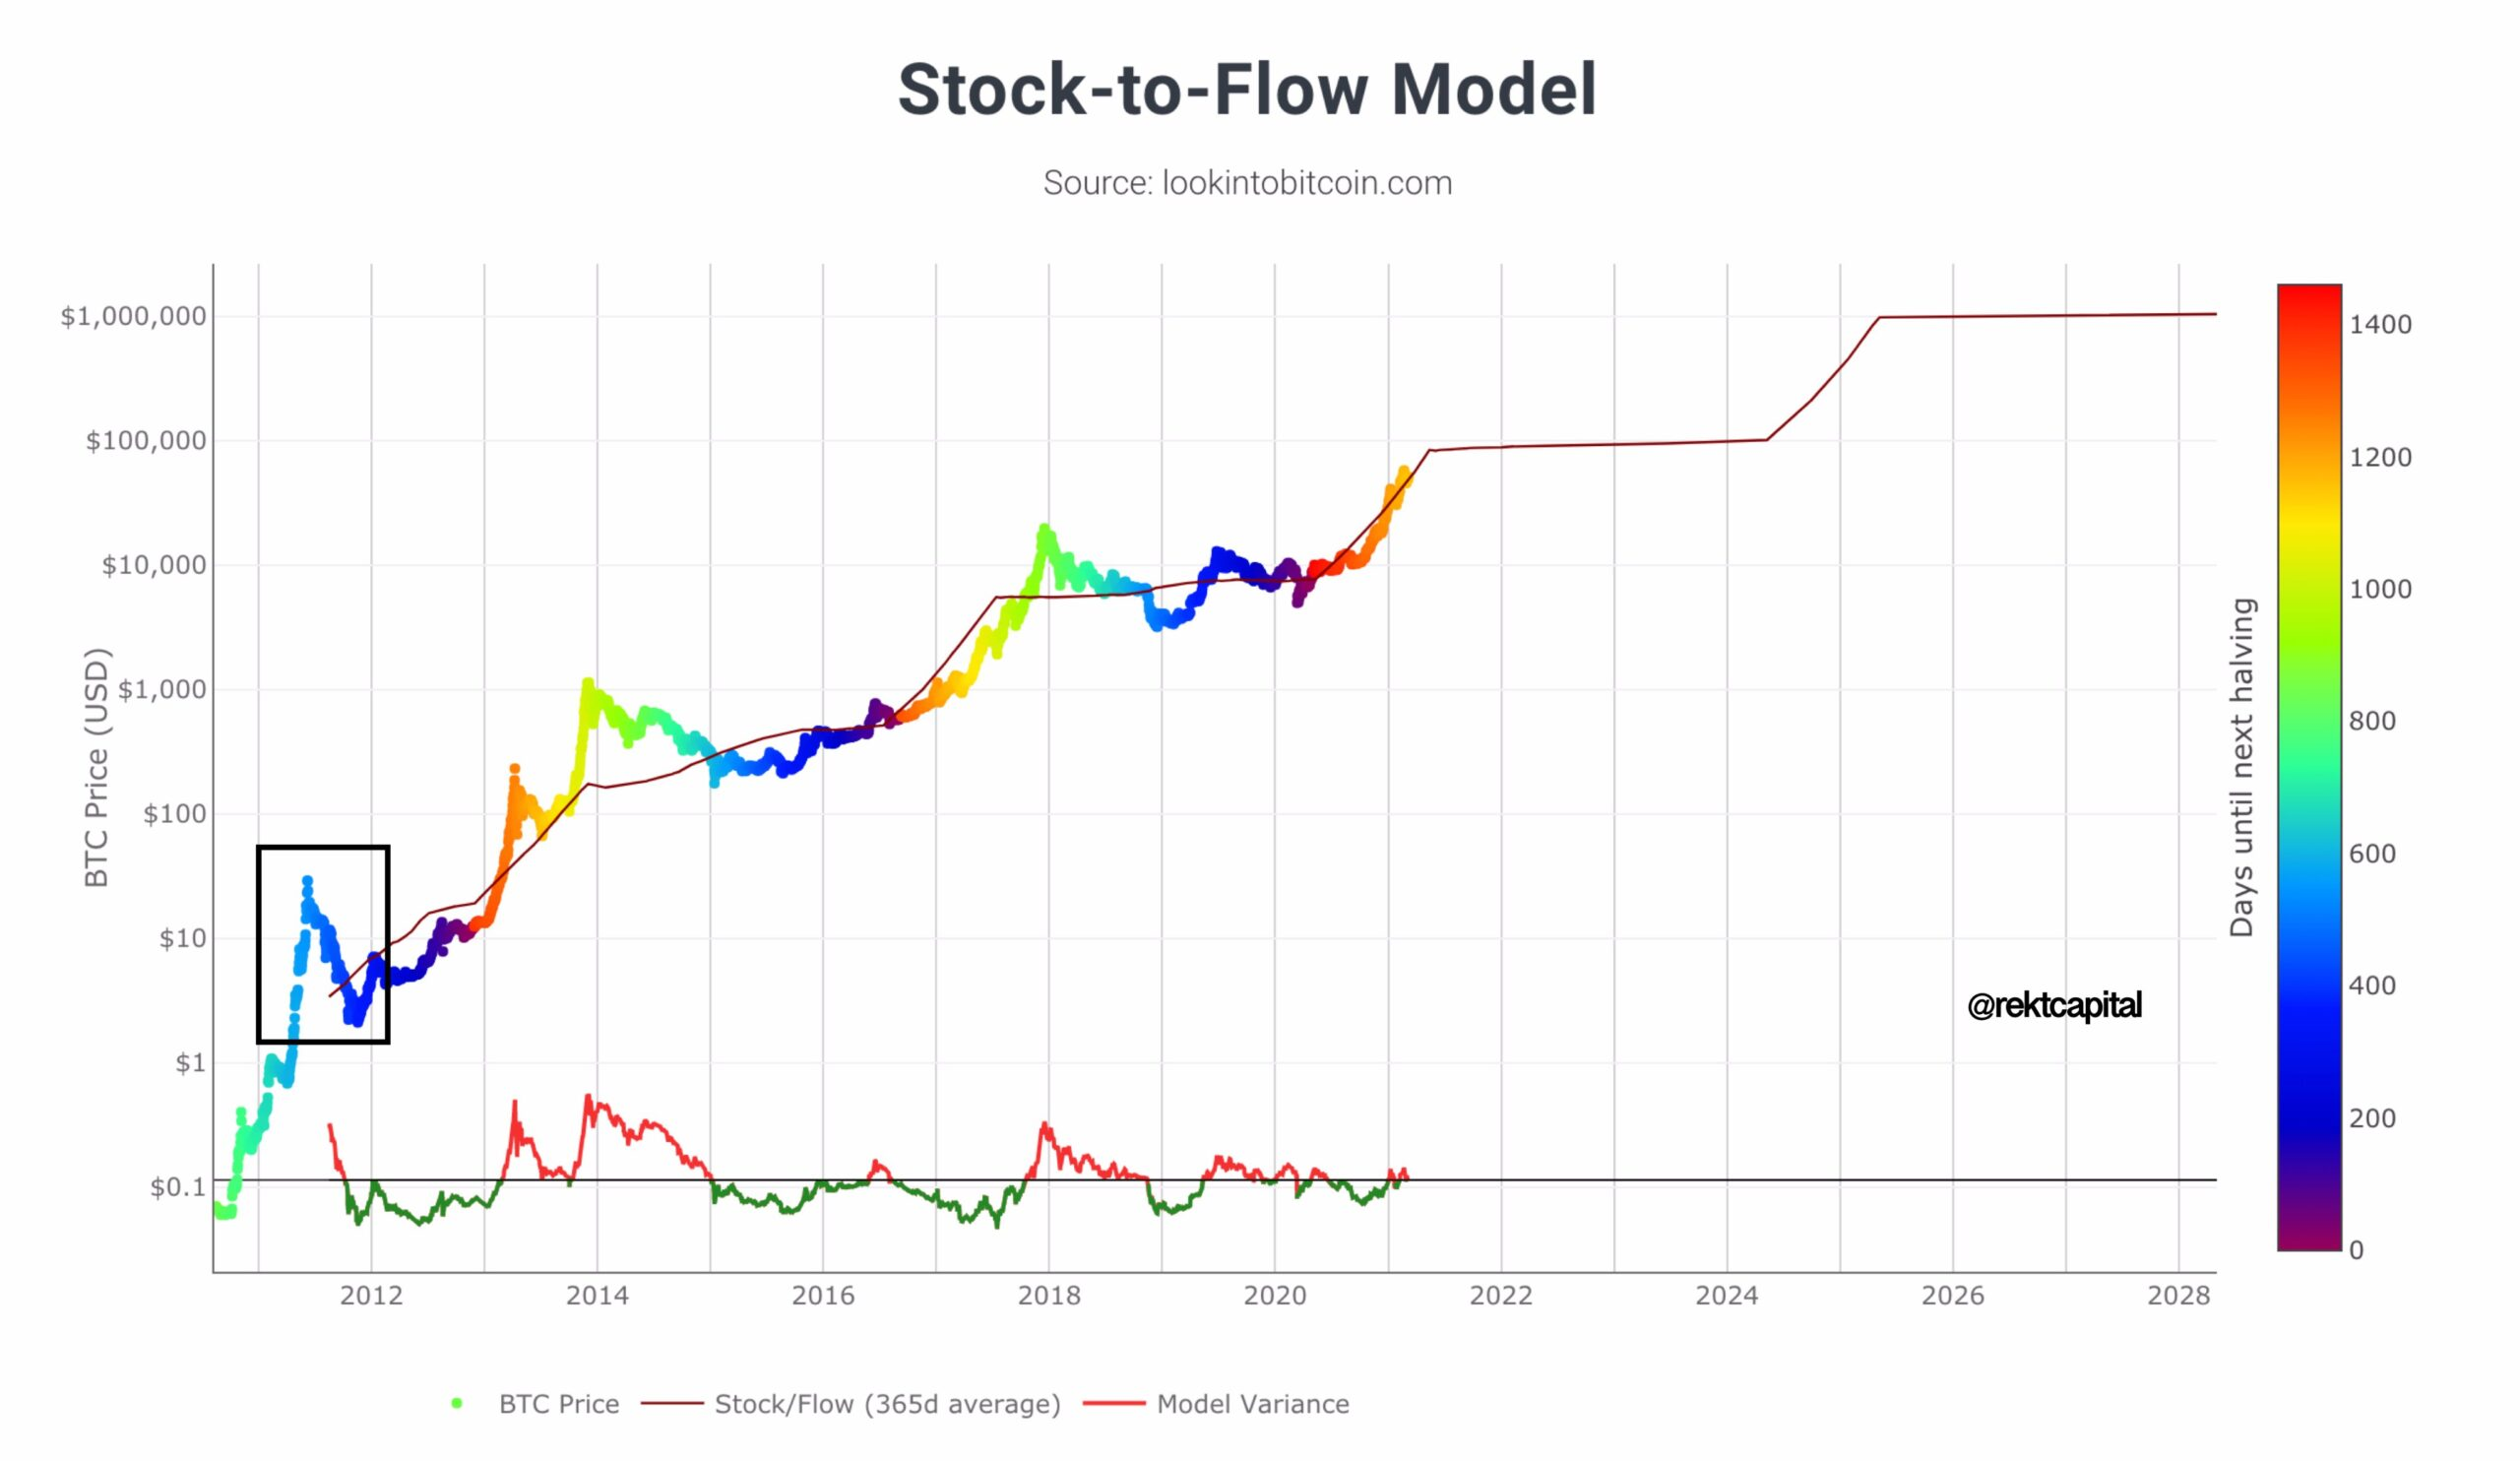 biểu đồ mô hình stock to flow